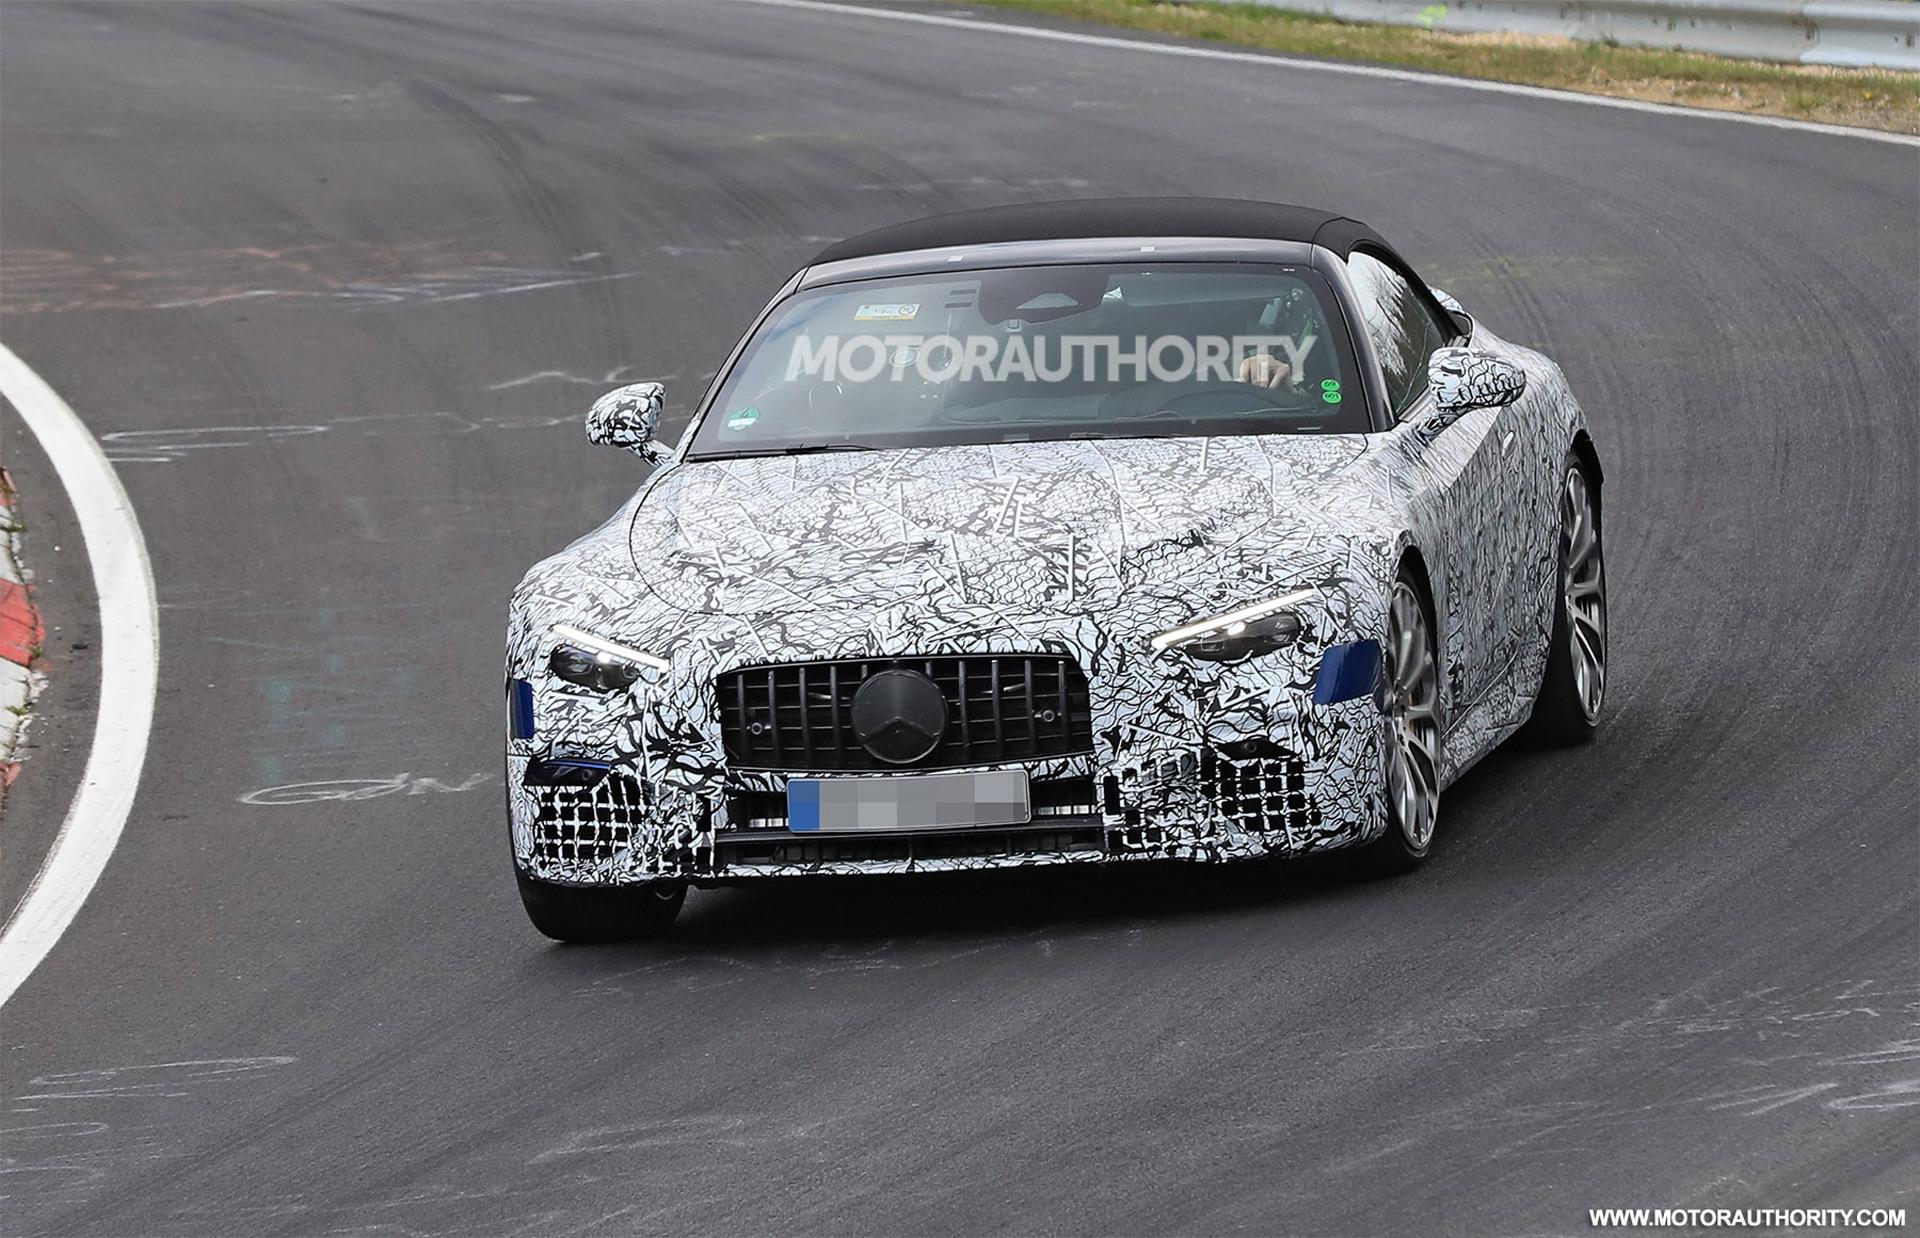 Nuova Mercedes-AMG SL Nurburgring foto spia